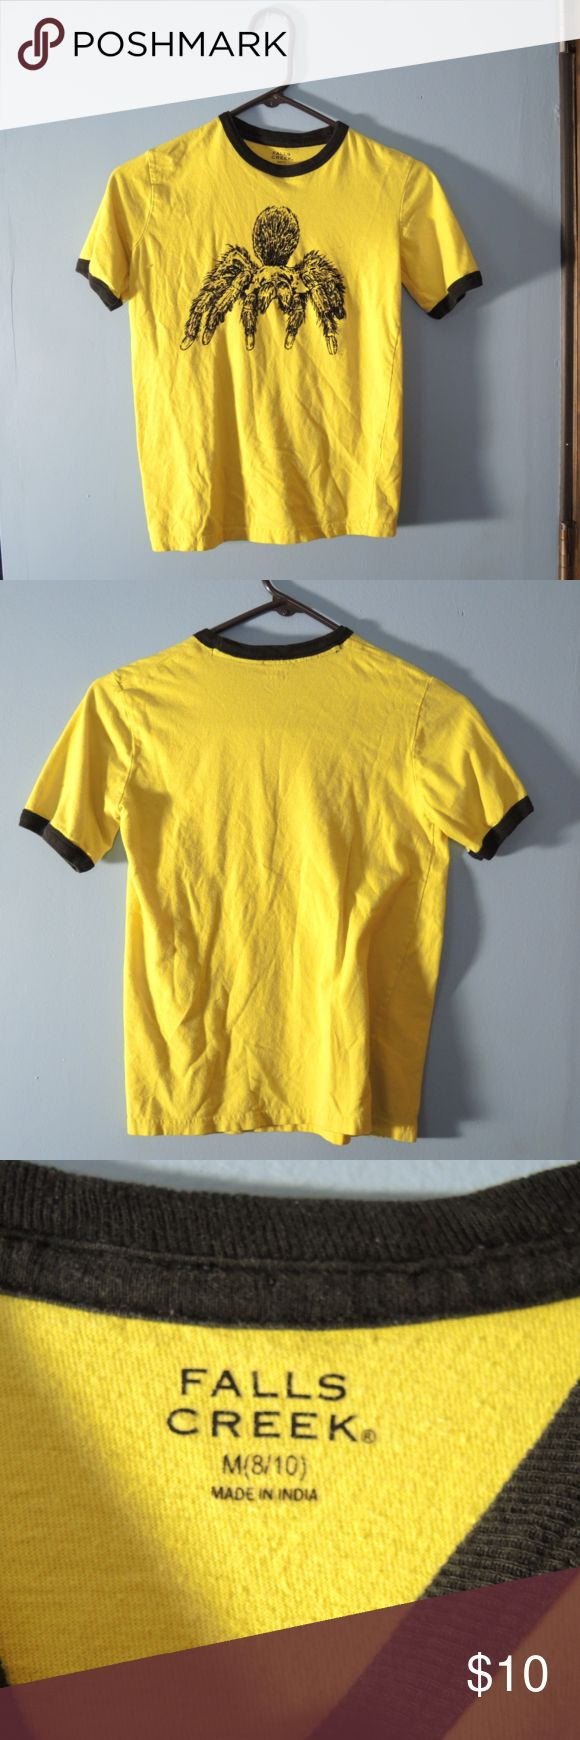 Boys Spider Tshirt Boys Yellow t-shirt with black raised Spider Falls Creek Shirts & Tops Tees - Short Sleeve